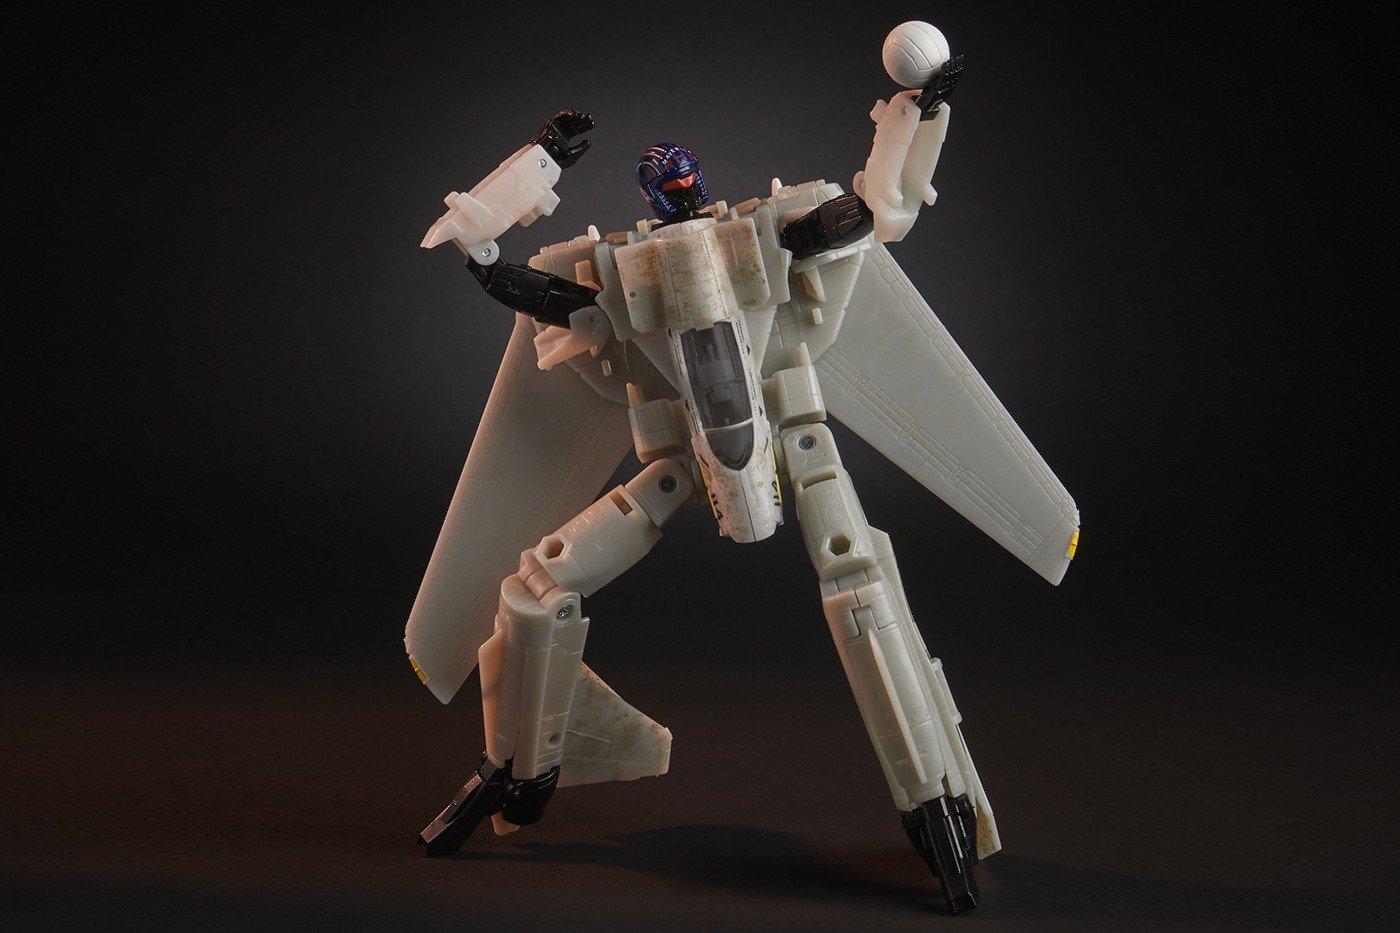 https___hypebeast.com_image_2020_07_top-gun-transformers-maverick-figure-hasbro-pulse-release-003.jpg.6bf5f34eec02a7e155915a181cf3fbf6.jpg